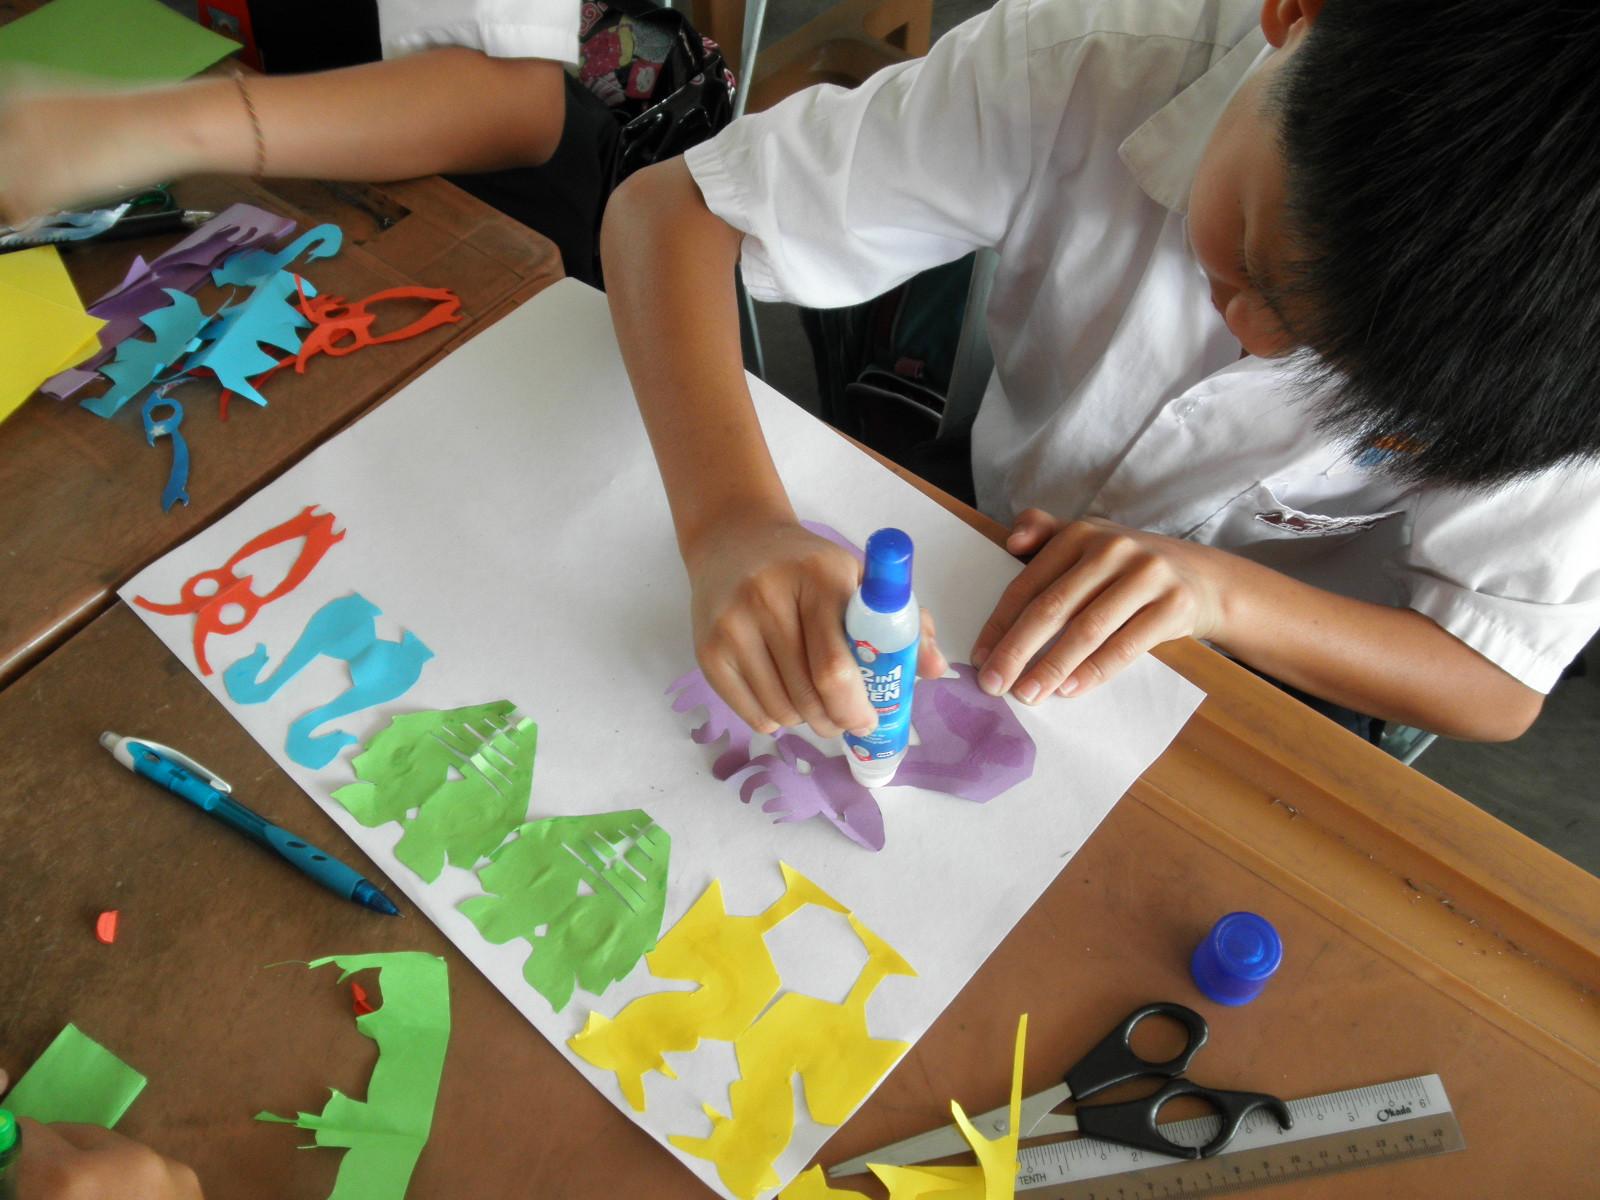 Image from Tnee Li Hong / Blogspot